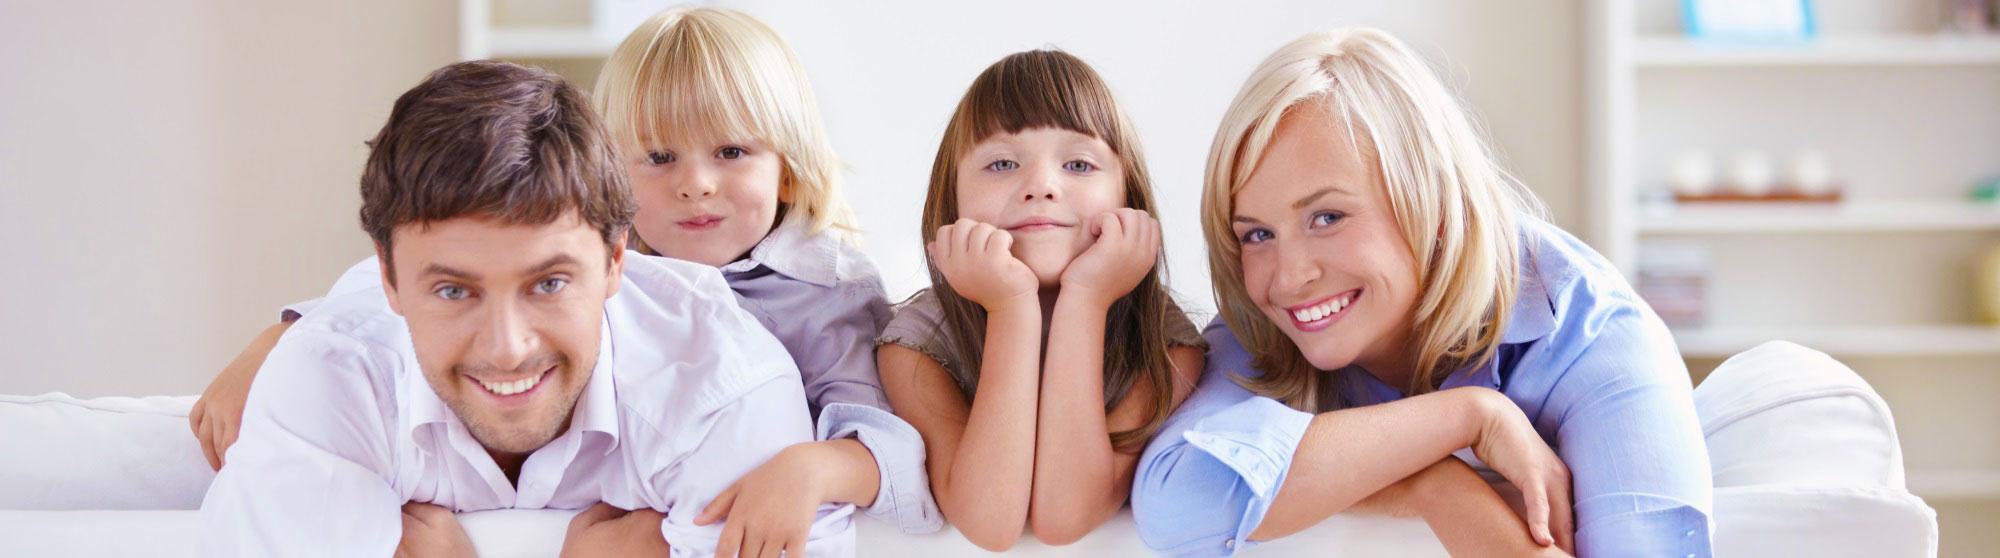 happy-families-web